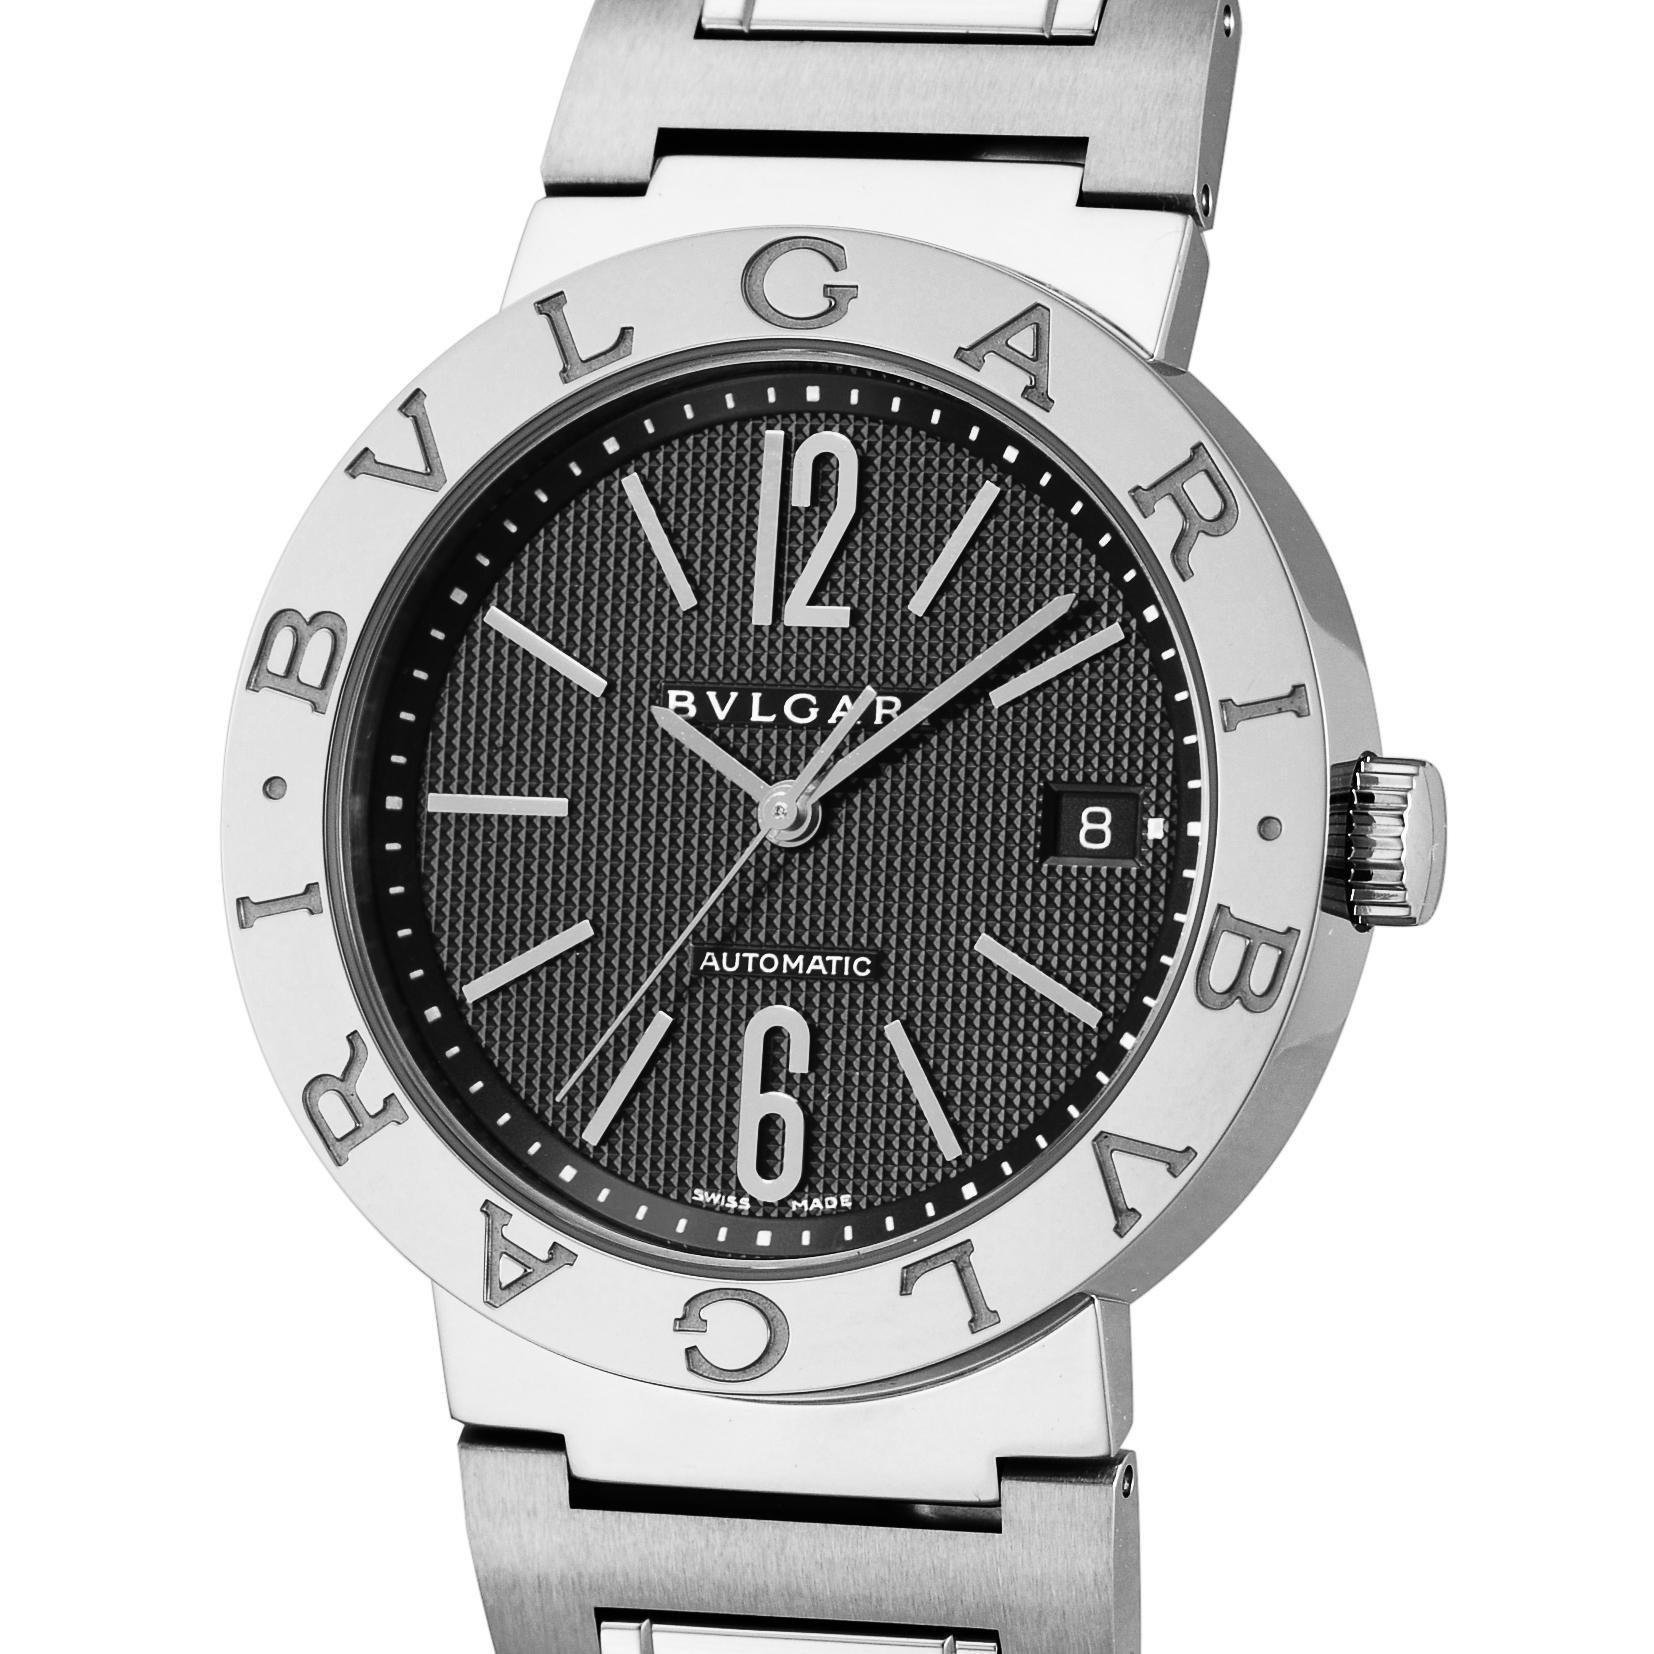 6c1c7dac1580 Amazon | [ブルガリ]BVLGARI 腕時計 ブルガリブルガリ ブラック文字盤 ...